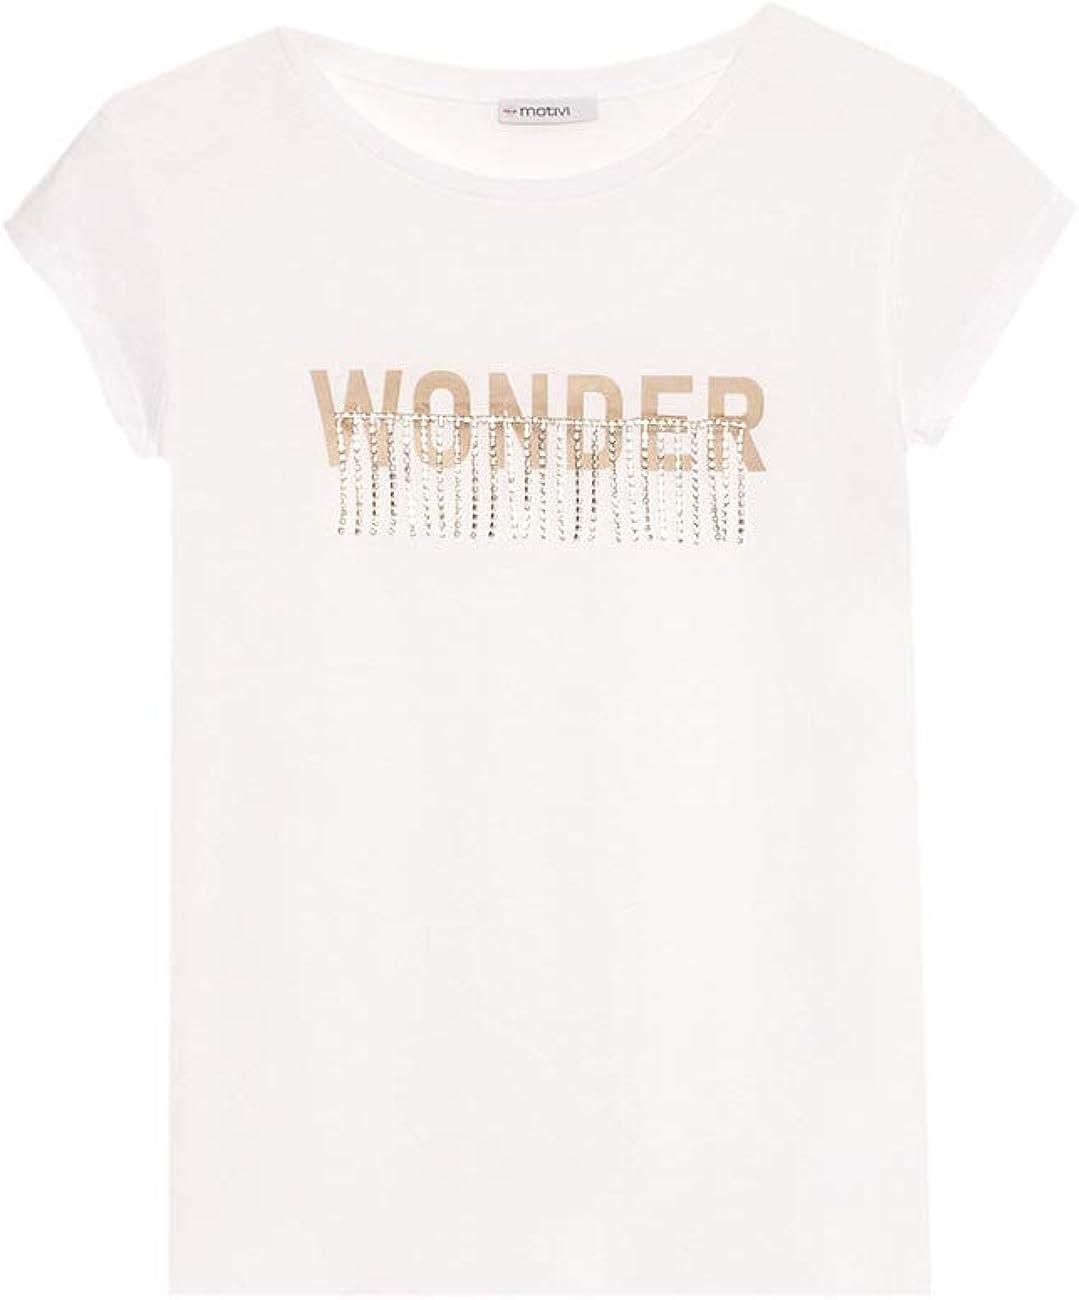 T-Shirt con Stampa Lettering Motivi Italian Size